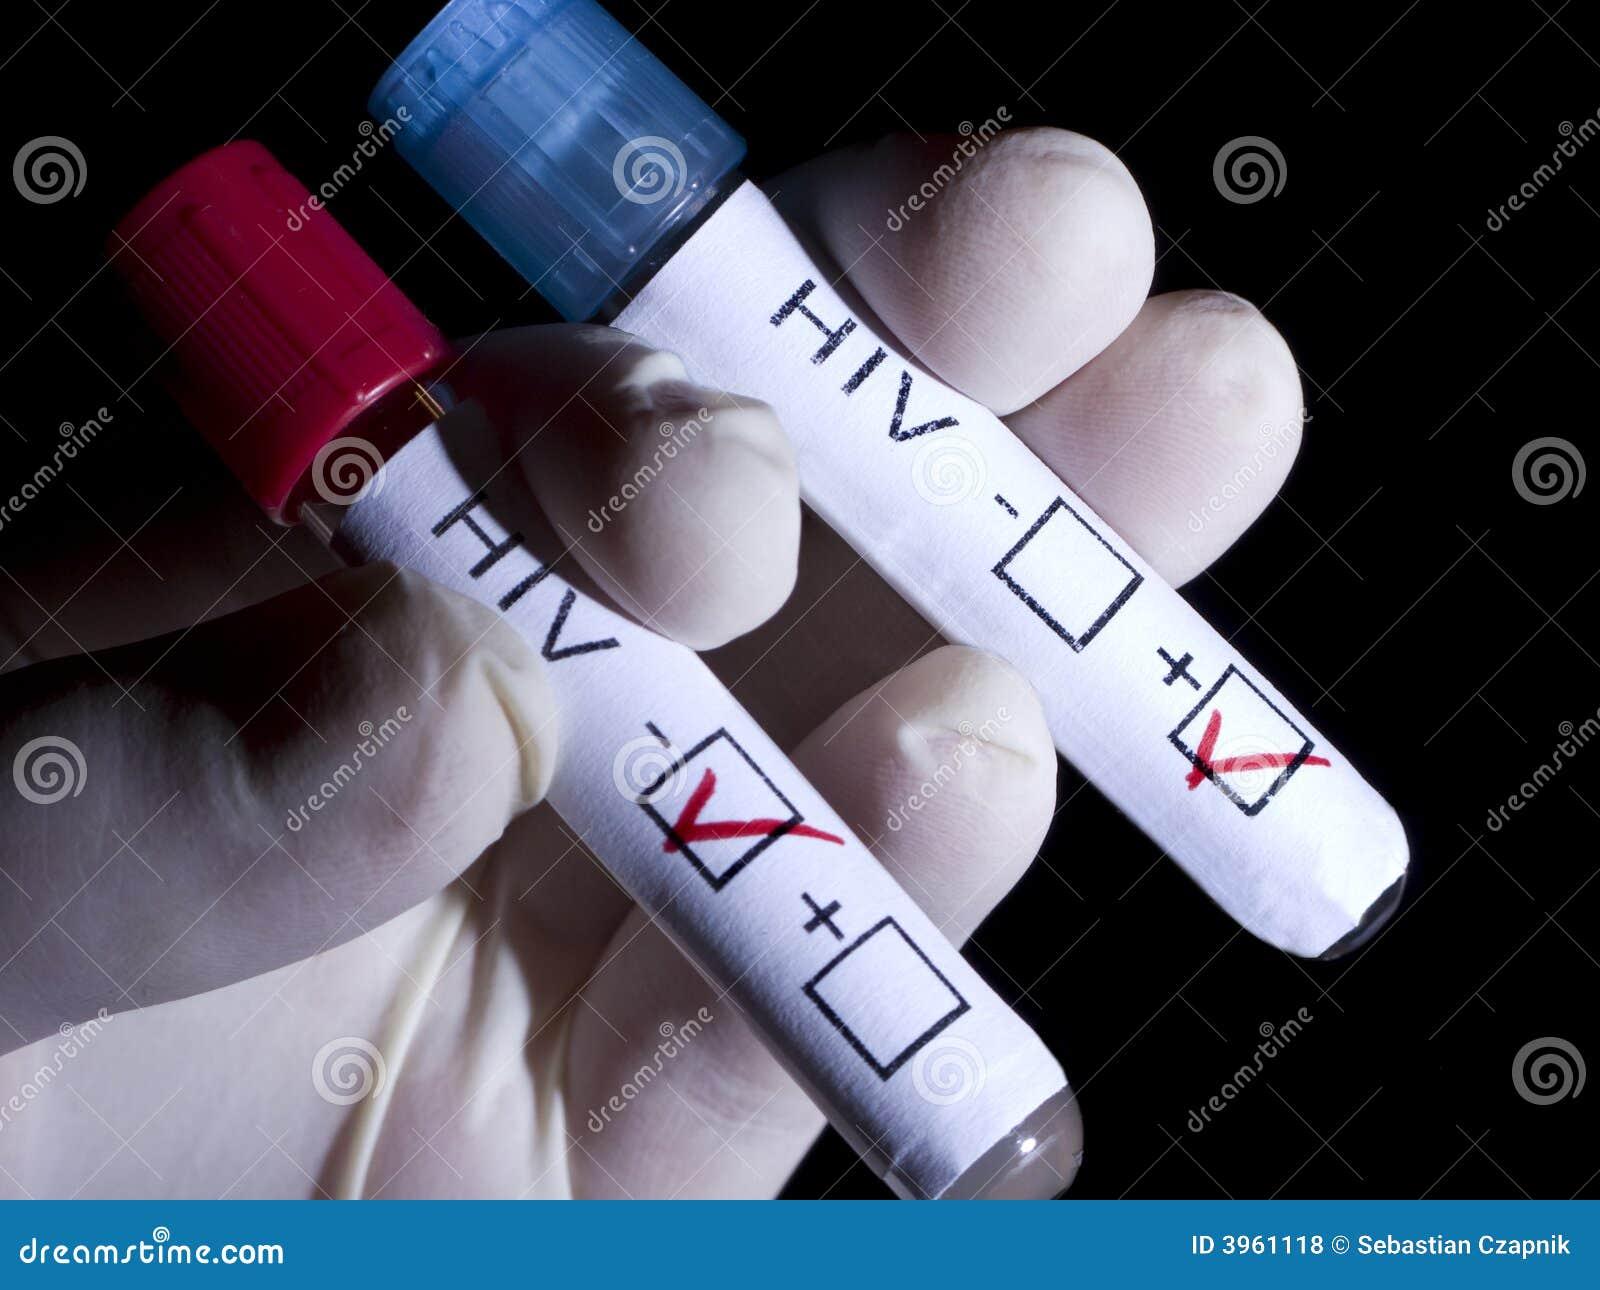 HIV-POSITIV und negativ